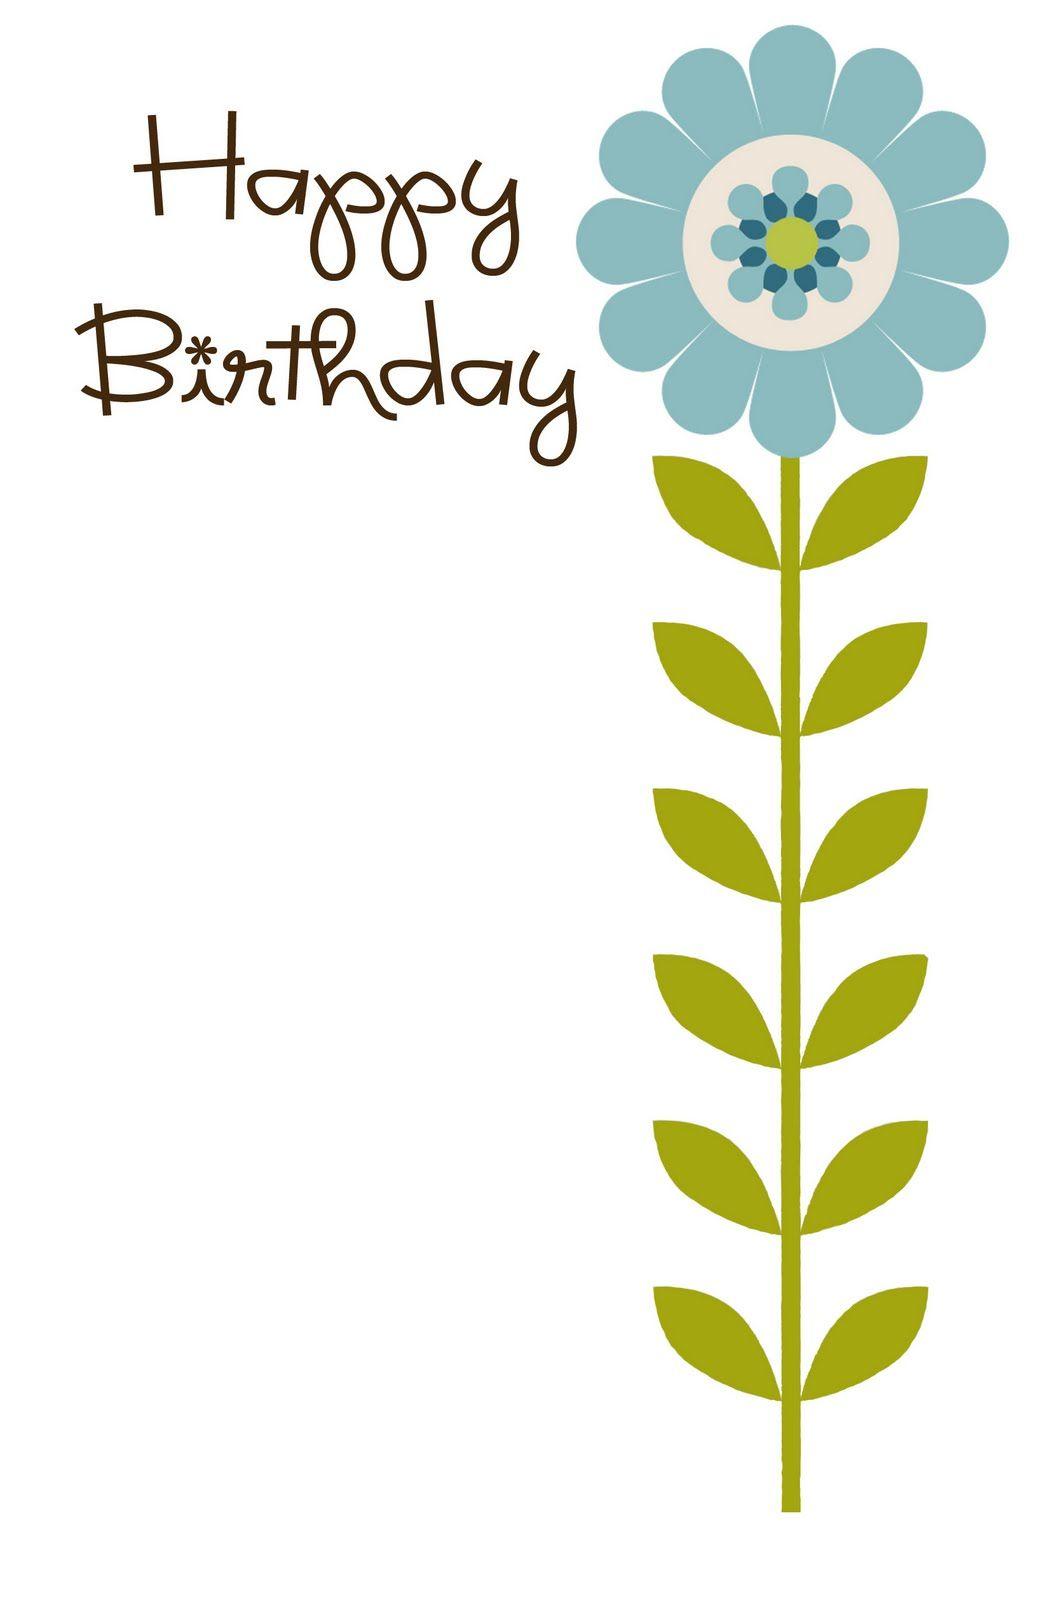 Birthday happybirthday ideas pinteres birthday happybirthday ideas more izmirmasajfo Image collections